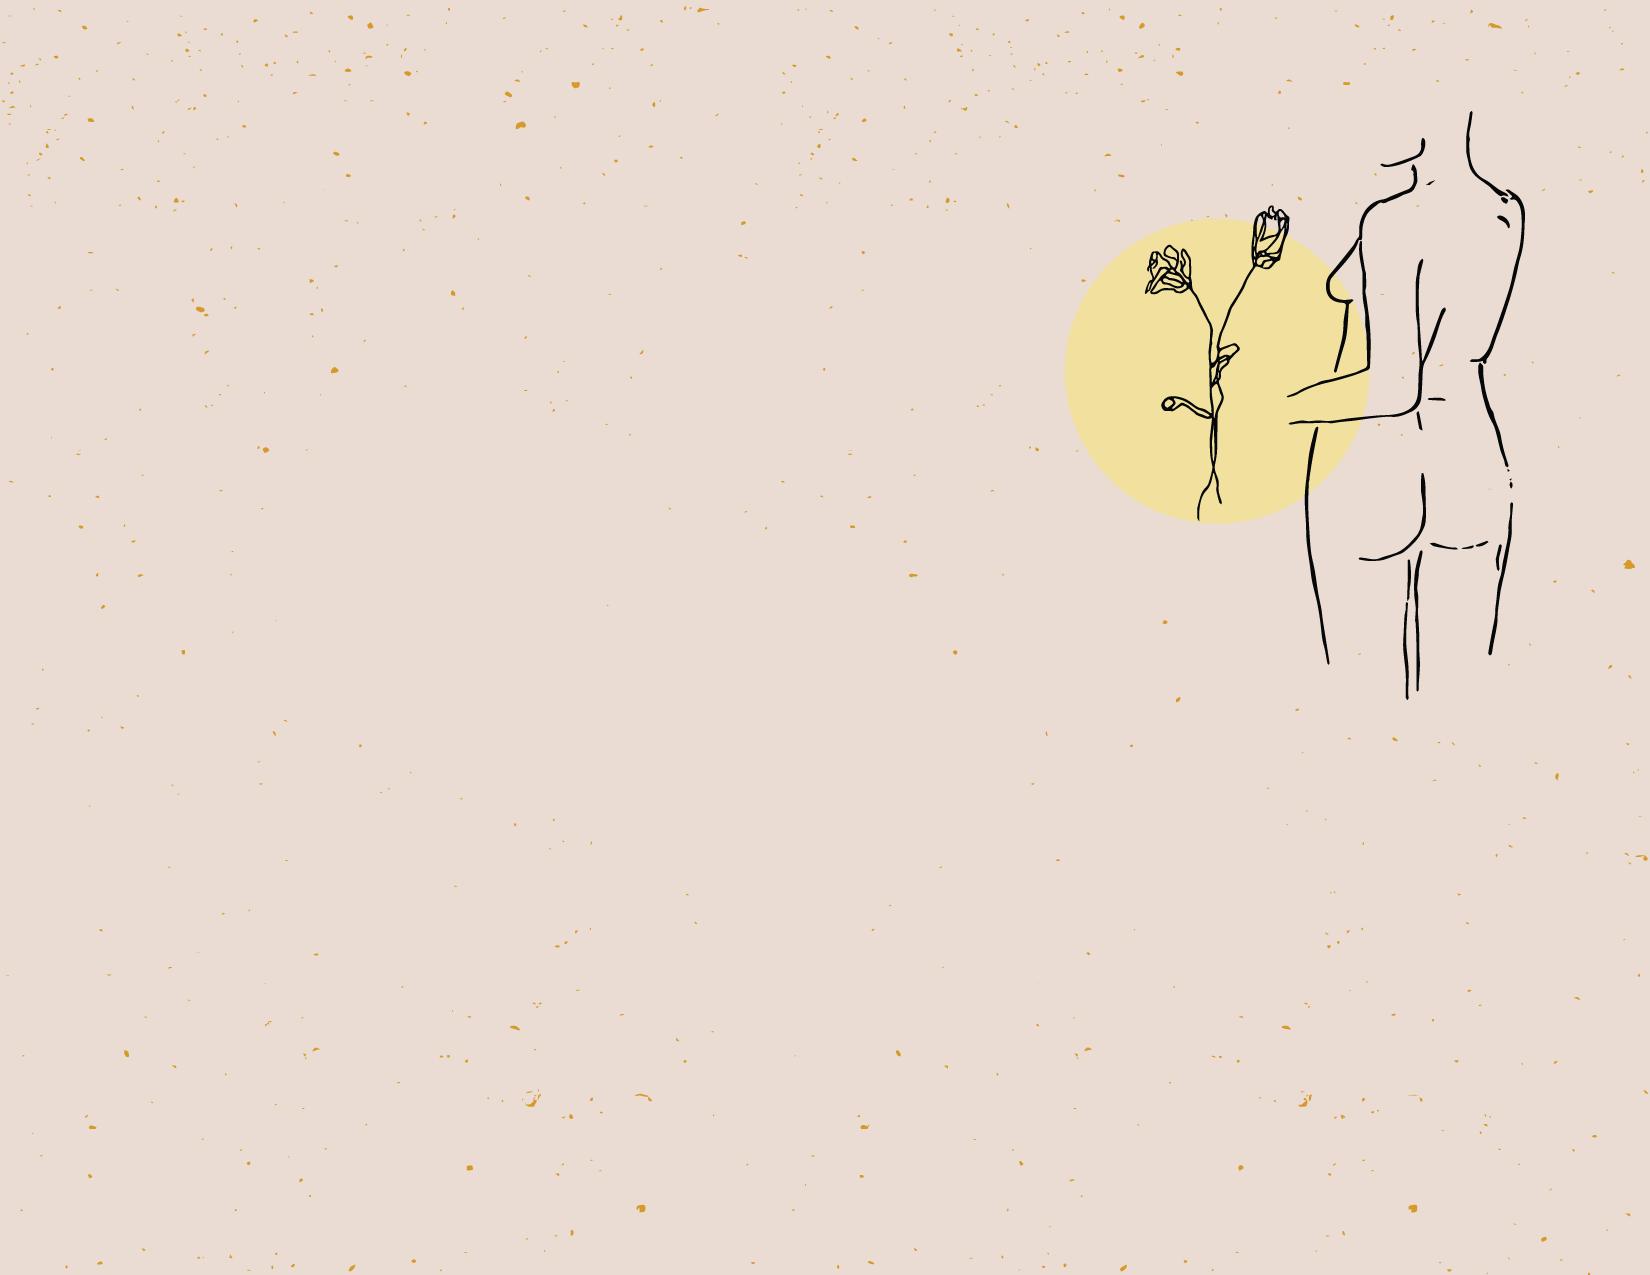 Nude_Gals1-01.png